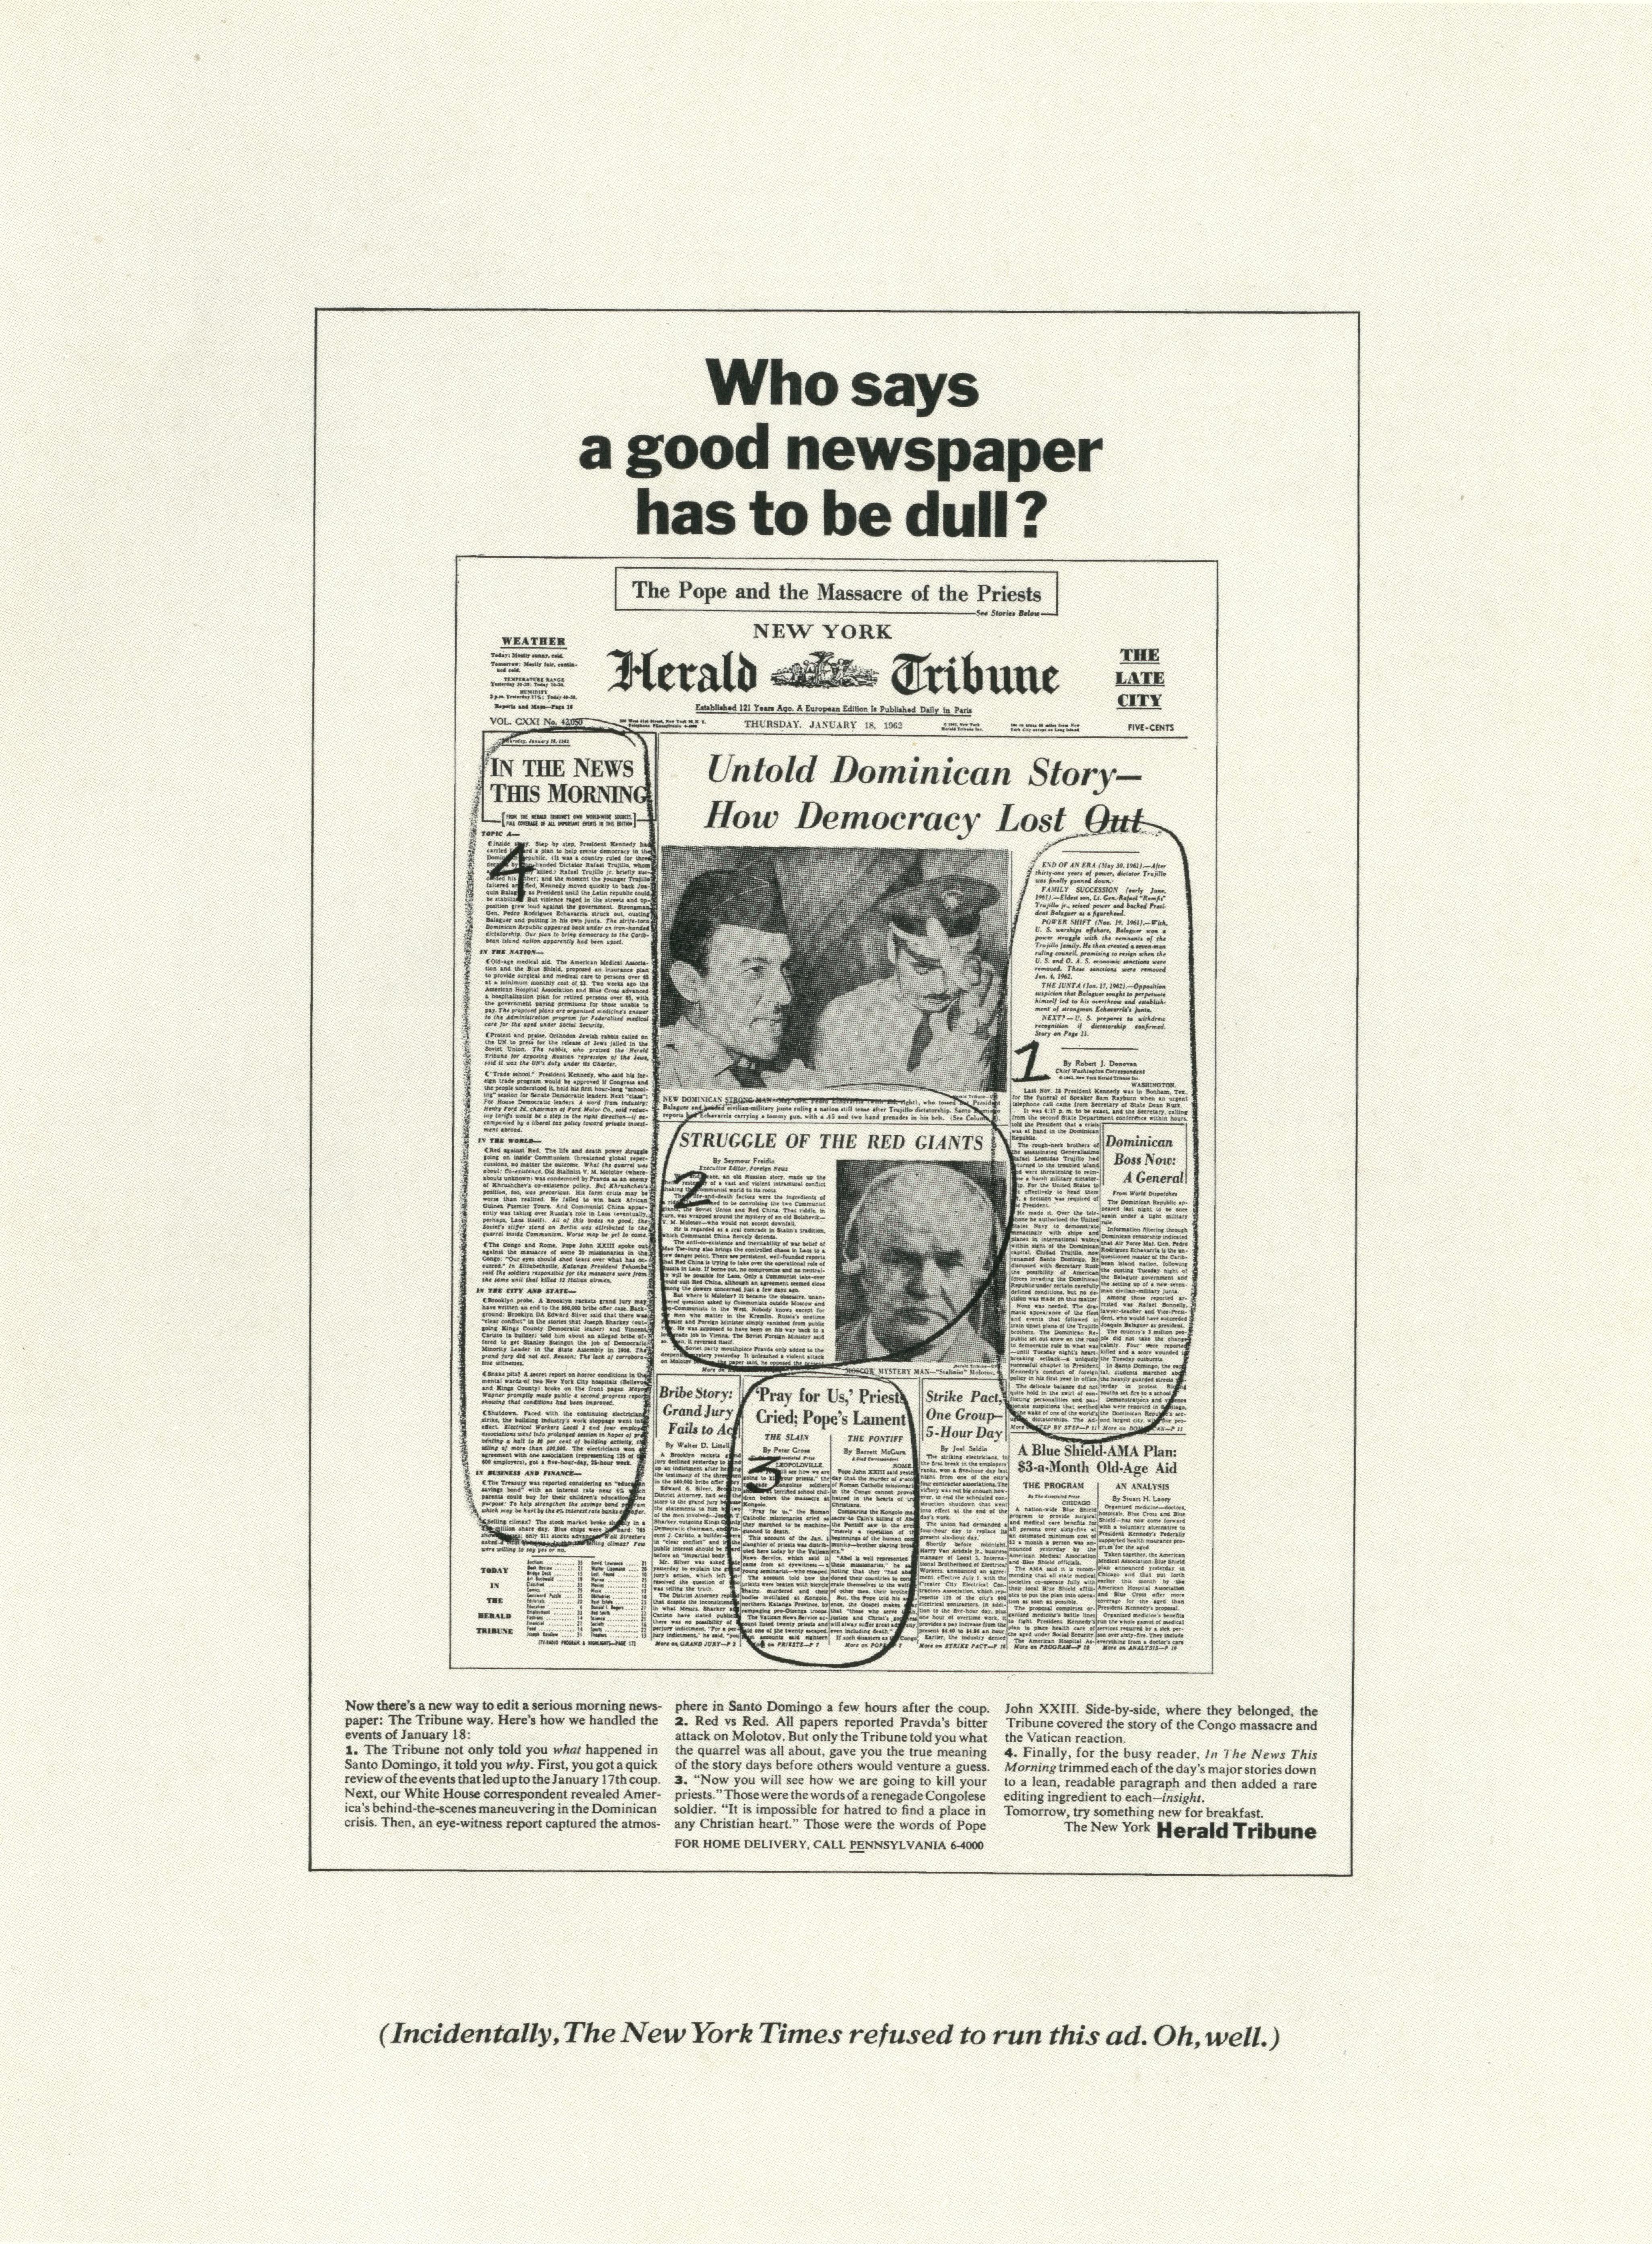 PKL2; Herald Tribune 'Dull:Scribble'